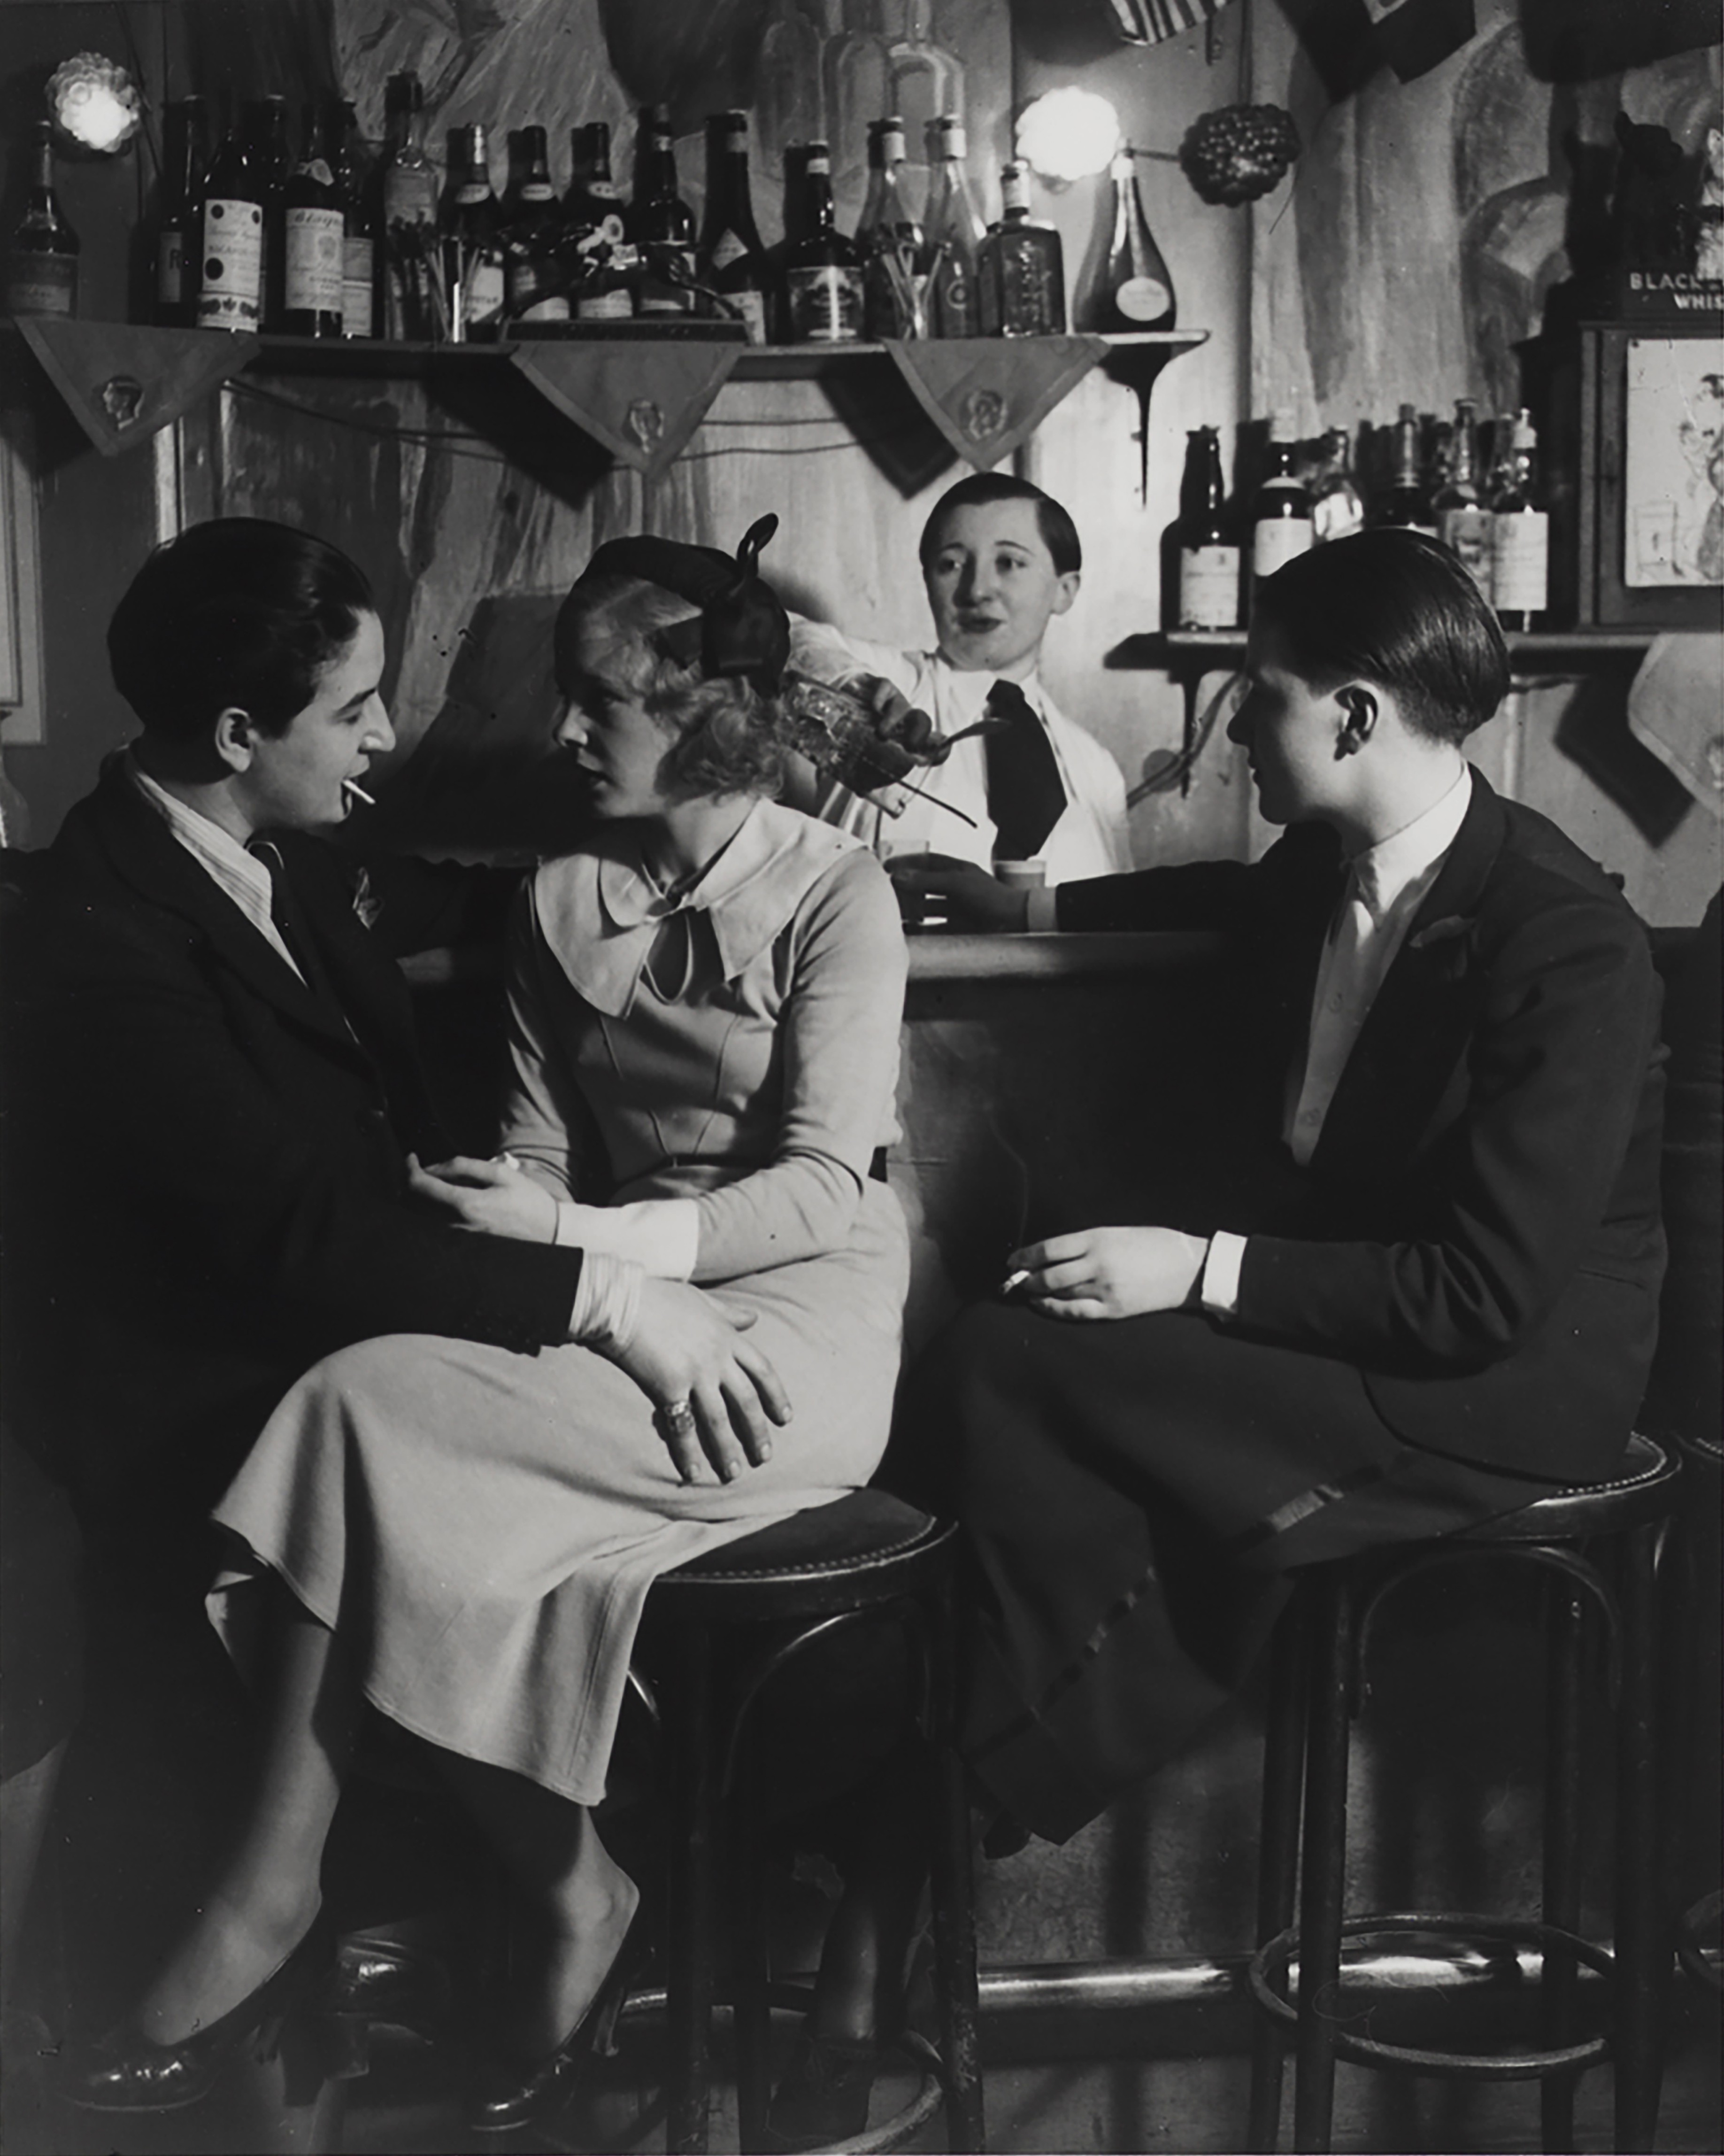 Ле Монокль, Бар, около 1932-1933. Фотограф Брассаи